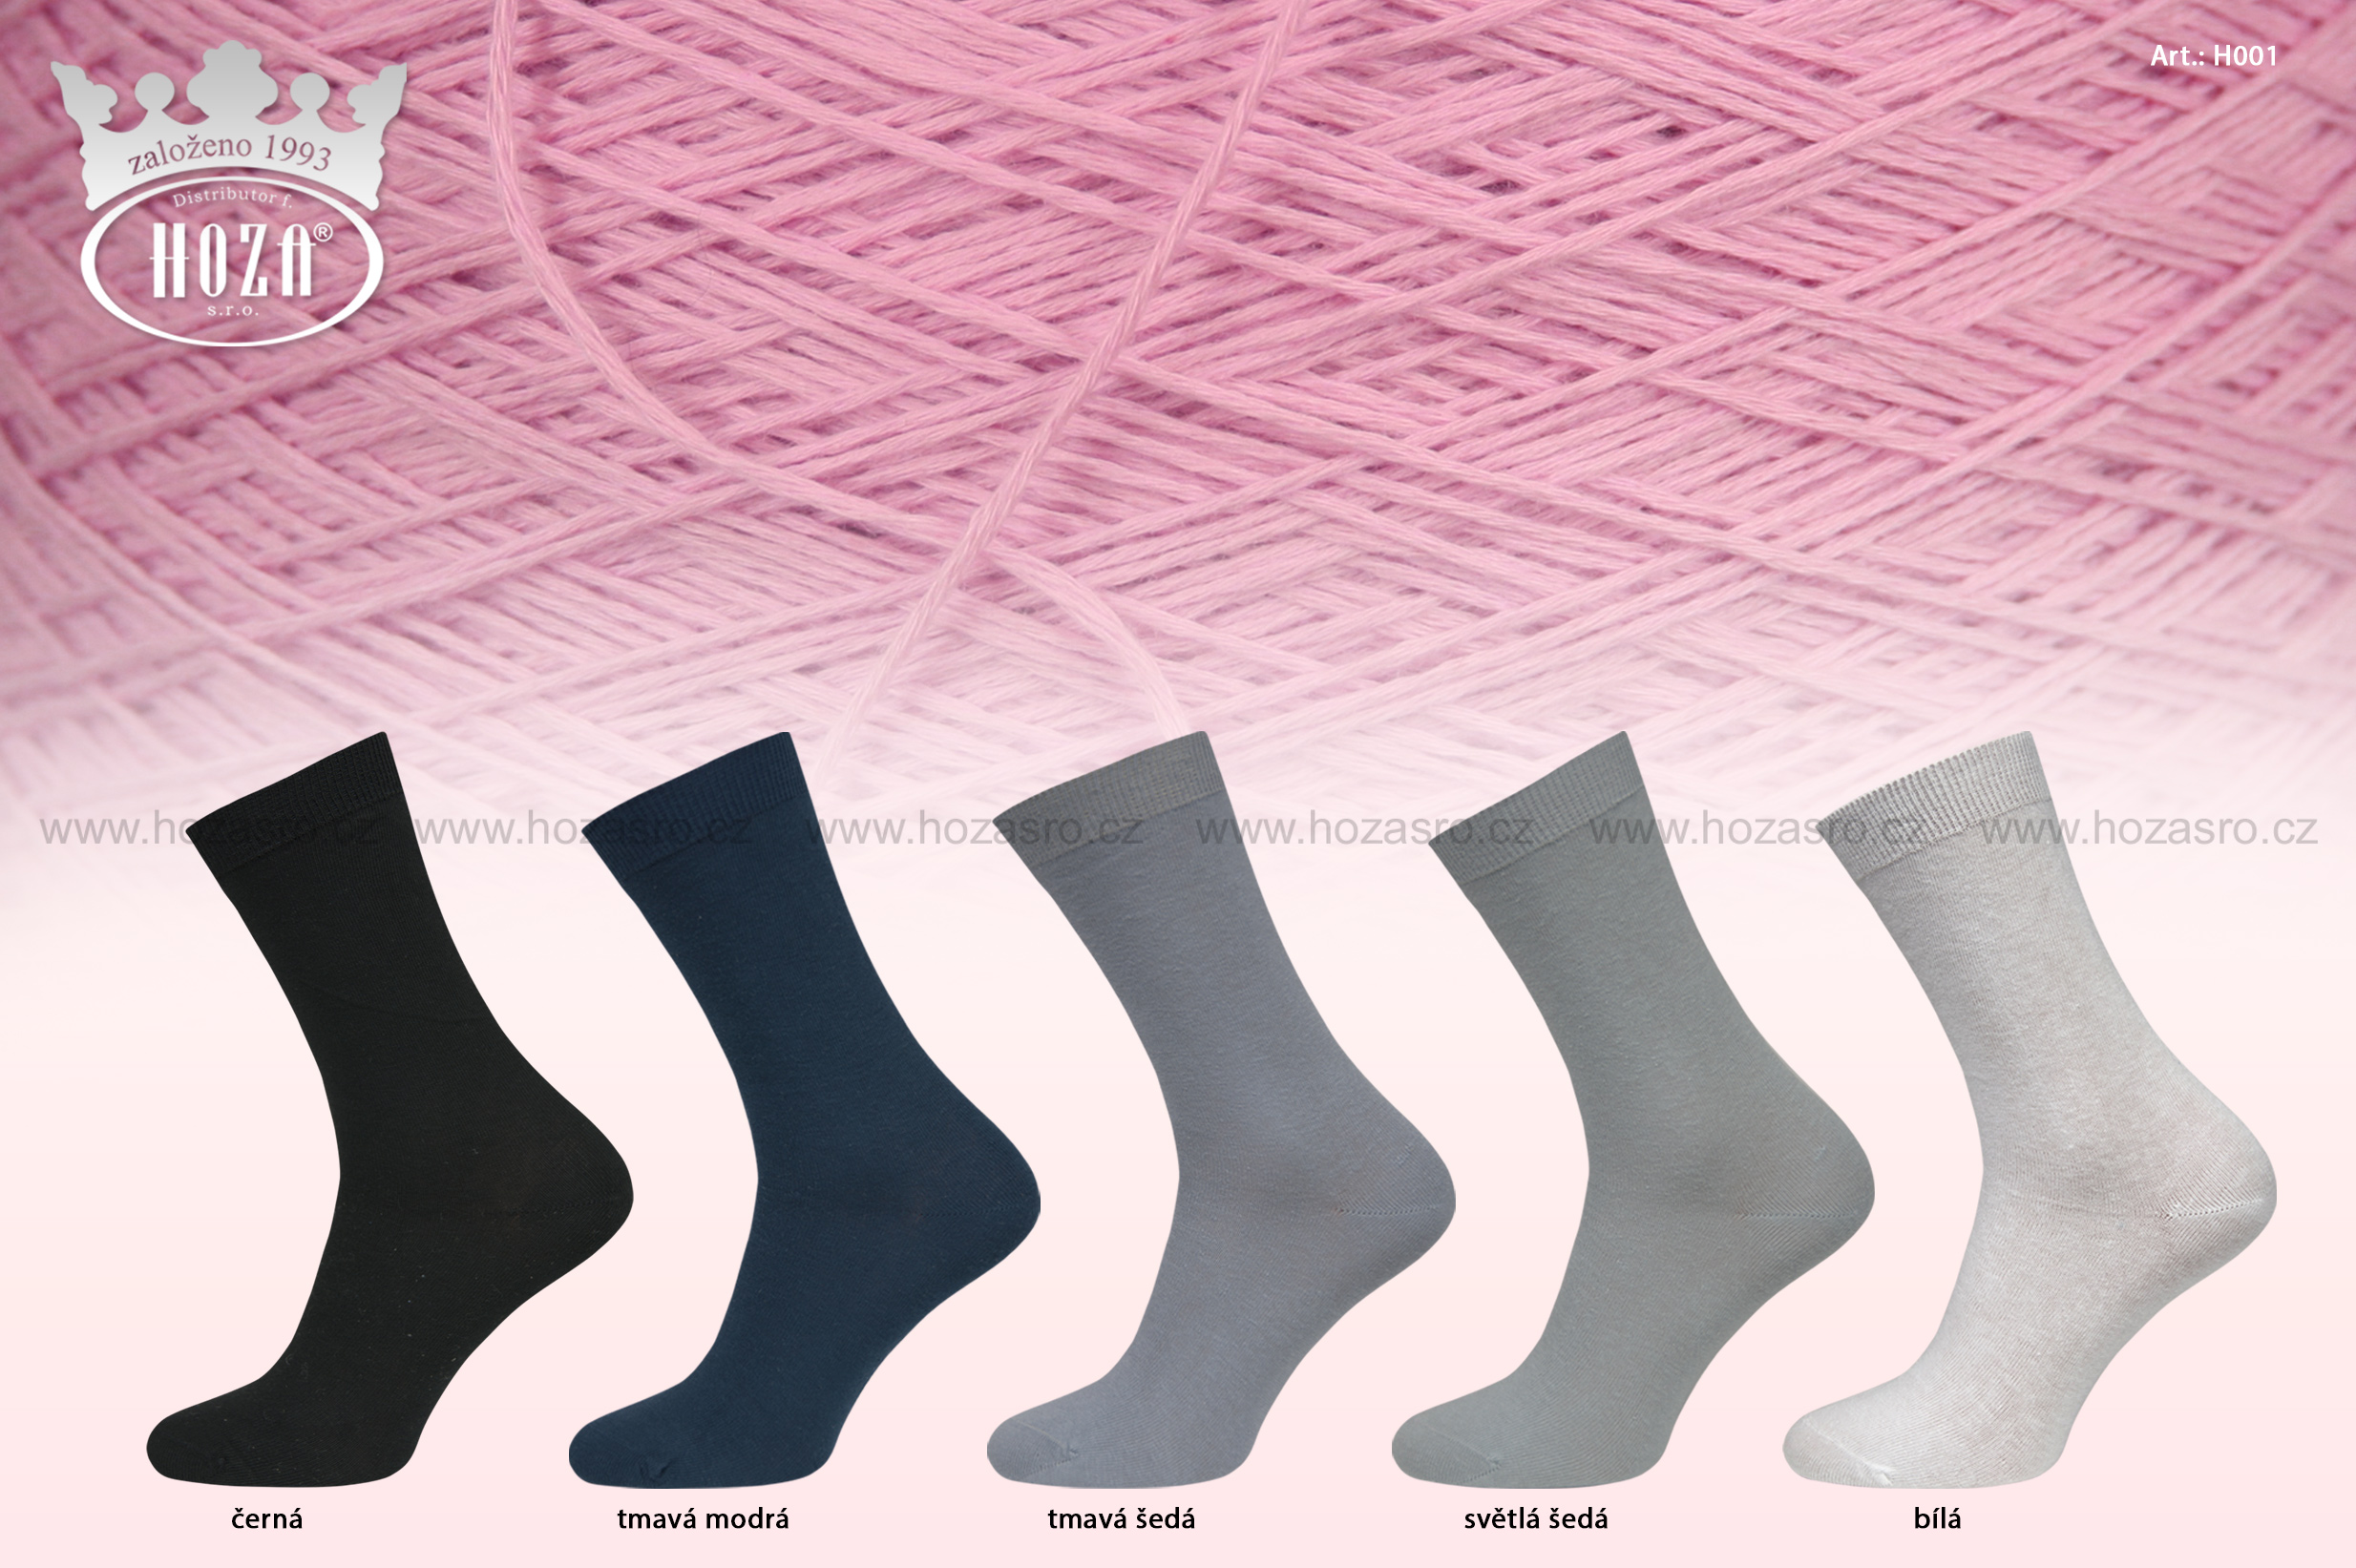 Dámské ponožky HOZA hladké, 100% bavlna - tmavý mix - H001